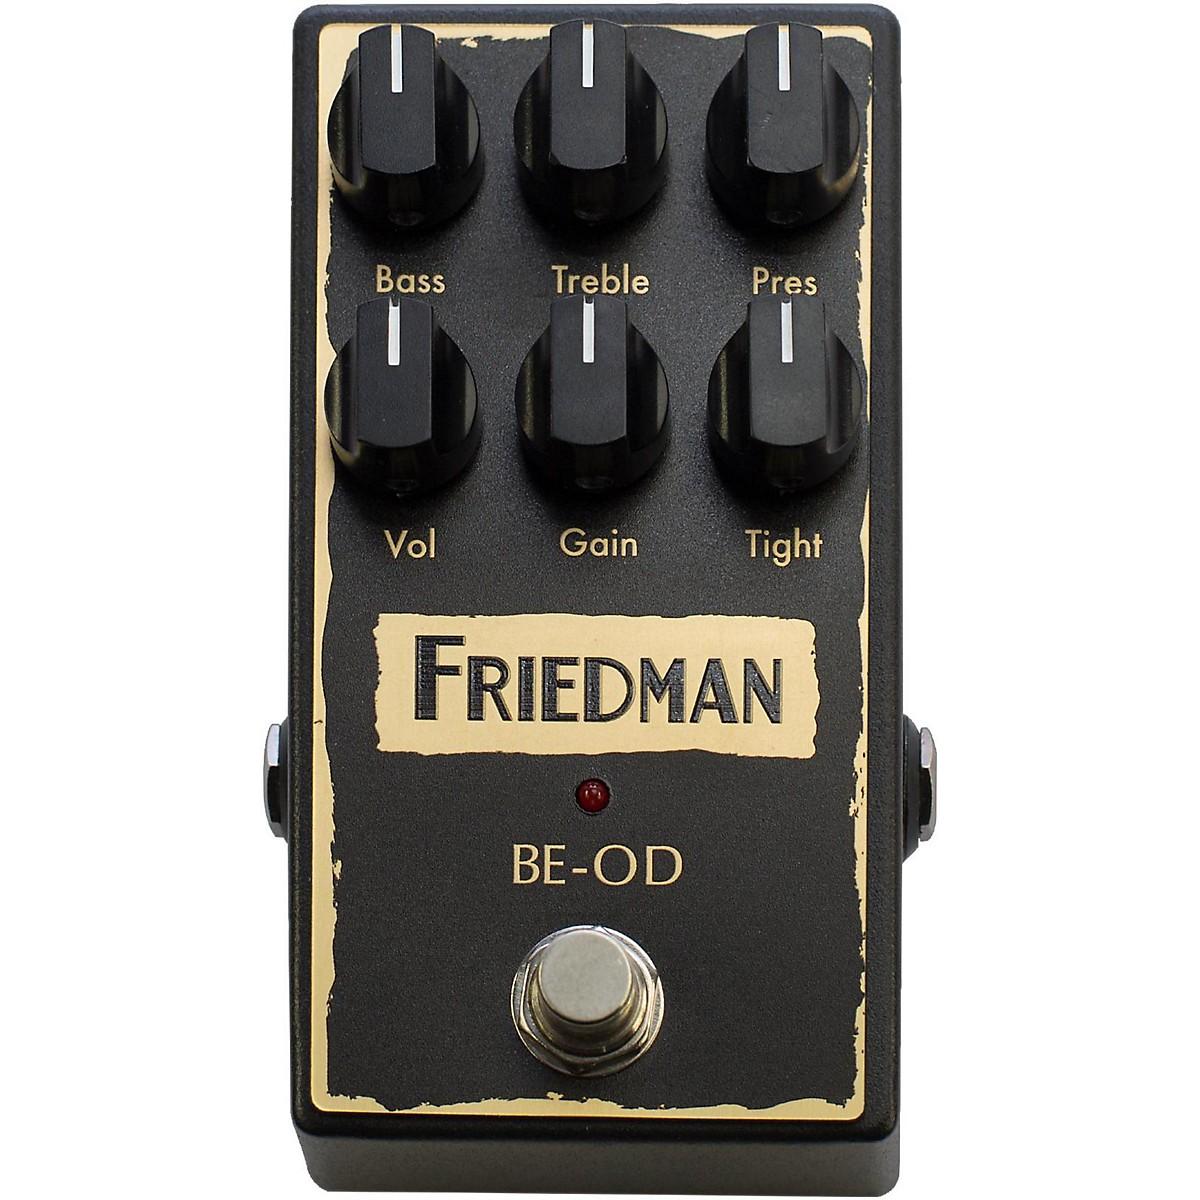 Friedman Brown Eye Overdrive Pedal